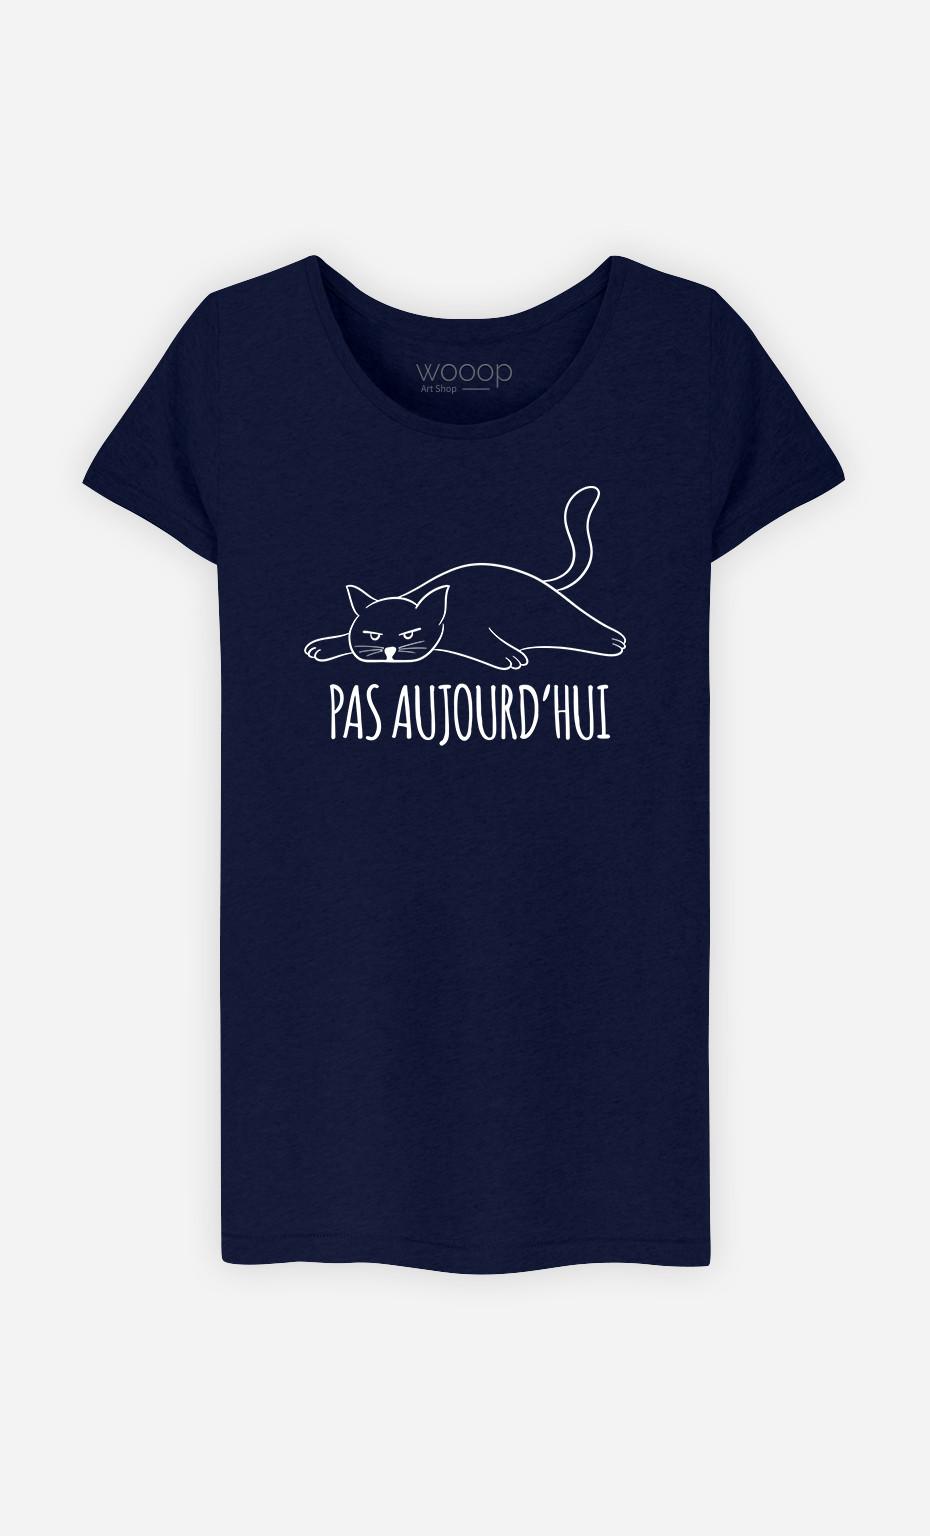 T-Shirt Femme Pas Aujourd'hui